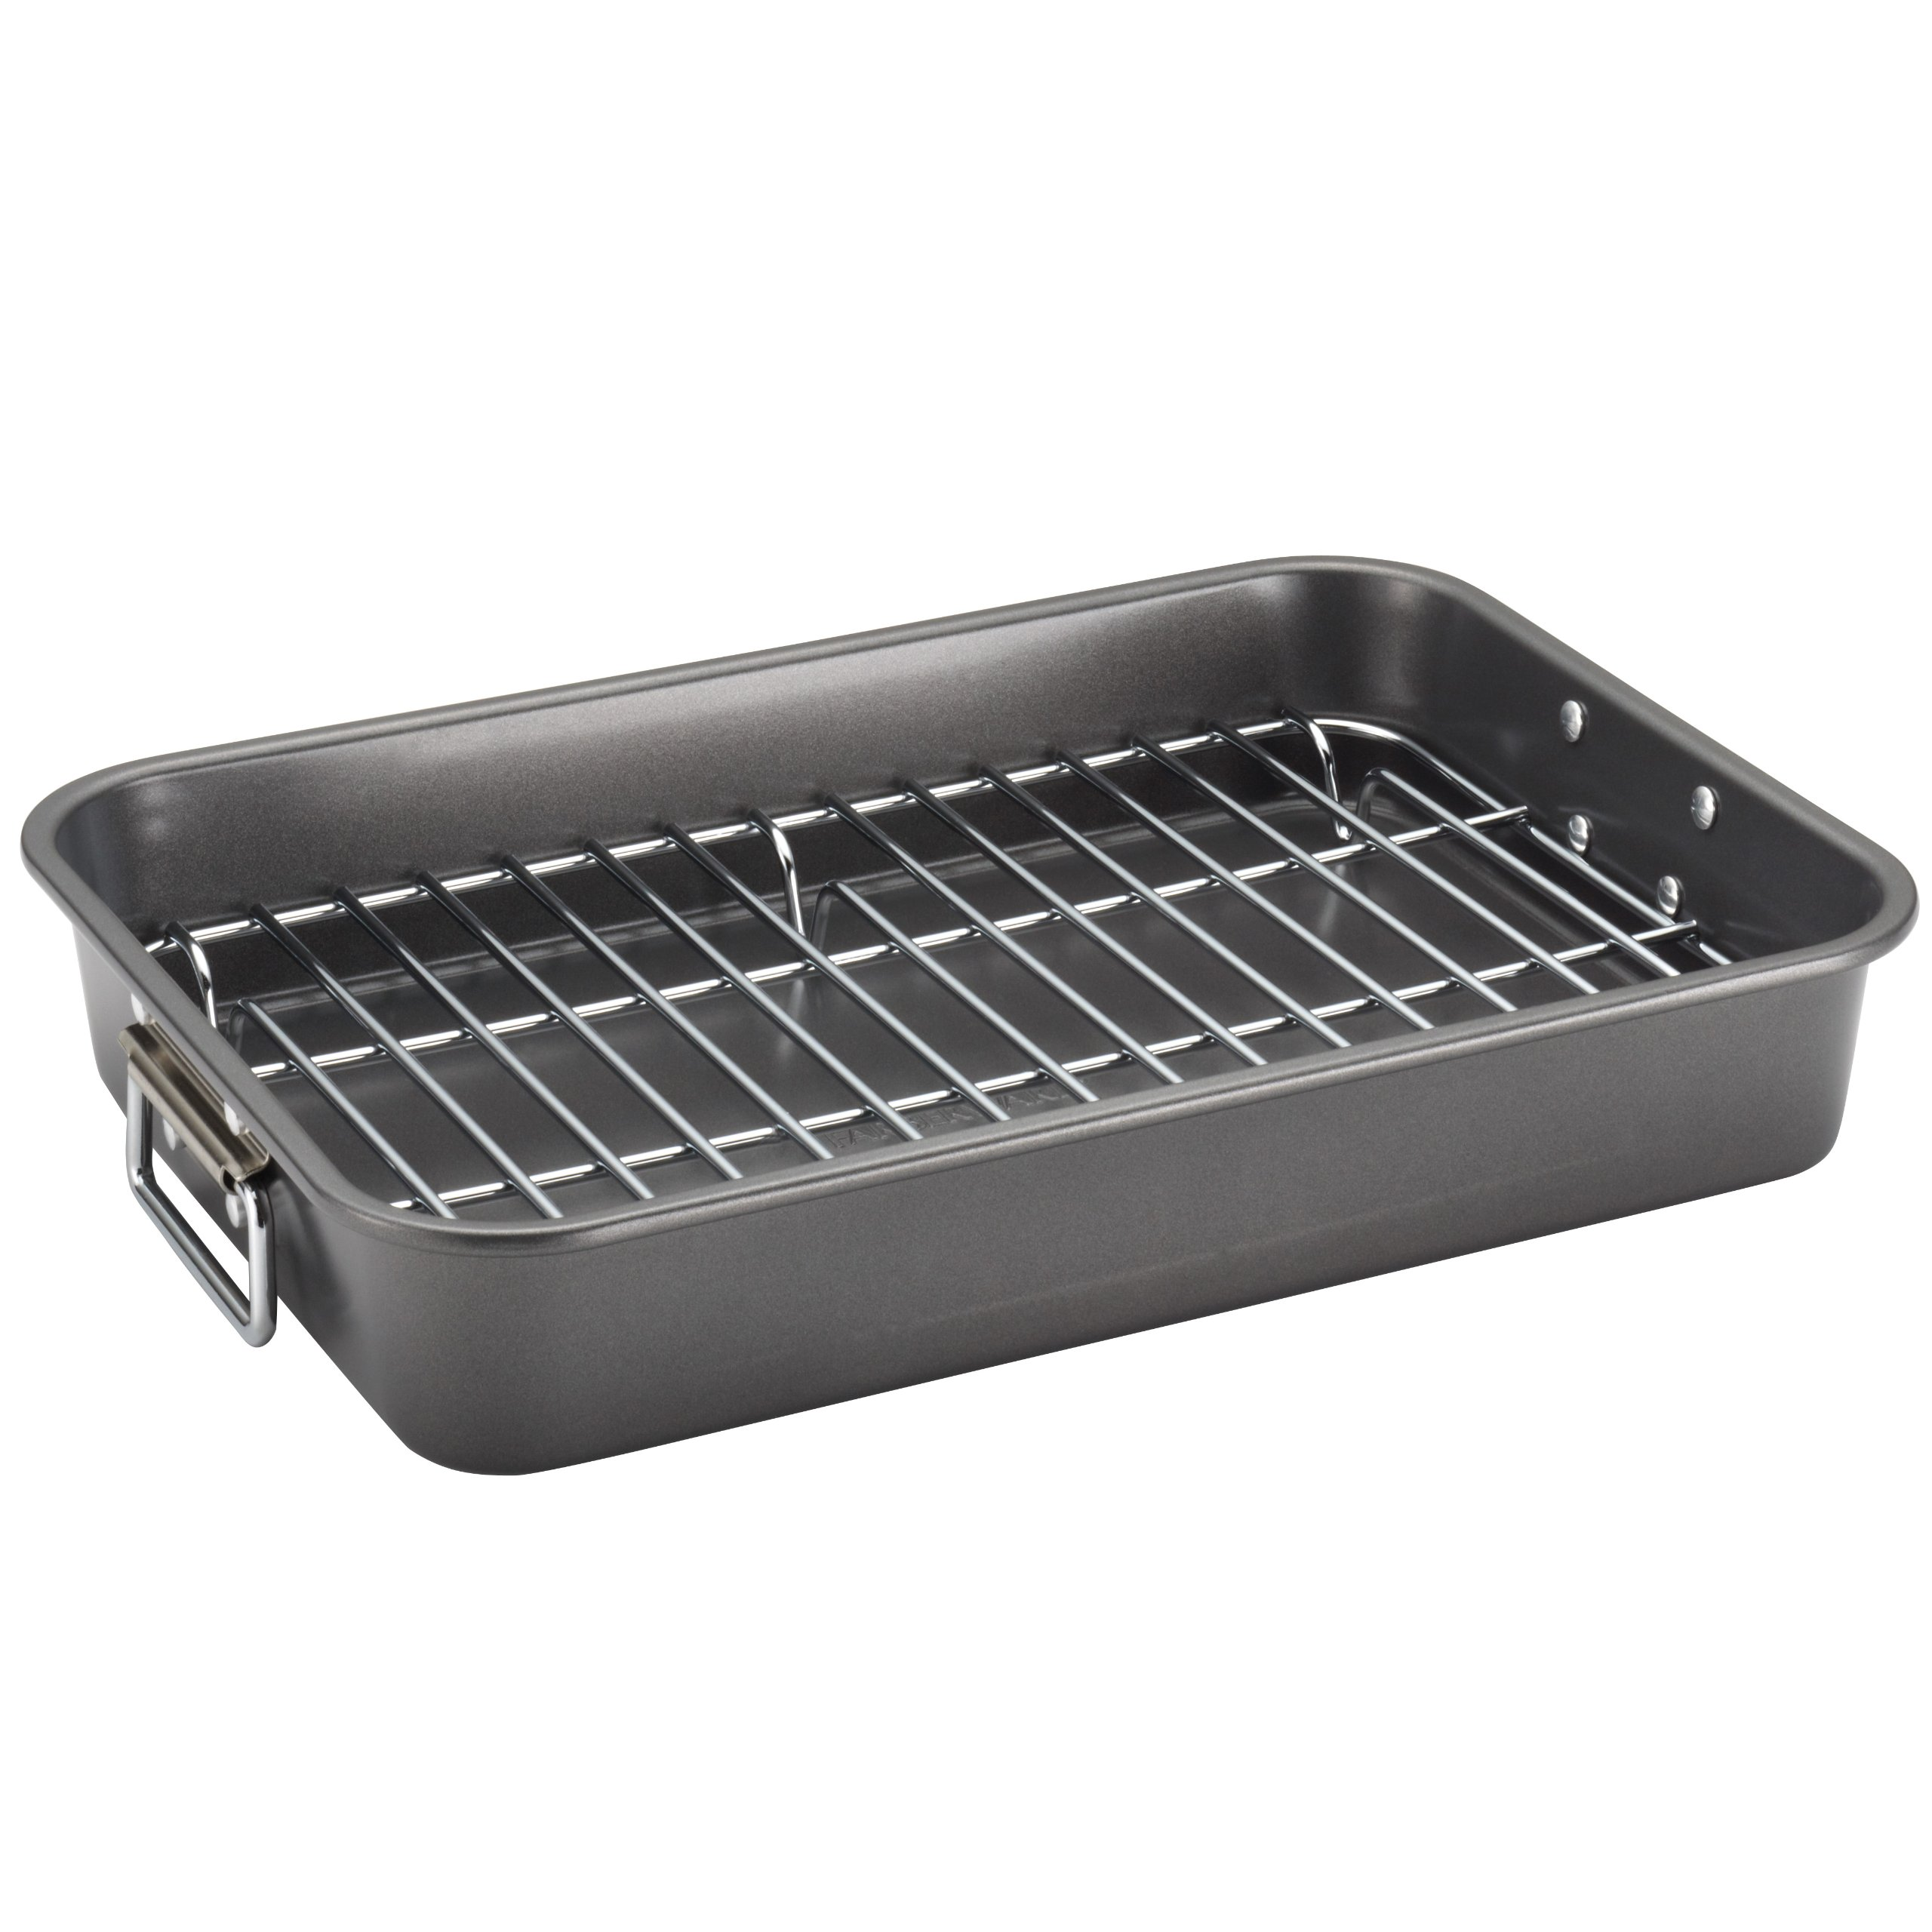 Farberware Nonstick Bakeware 11-Inch x 15-Inch Roaster with Flat Rack, Gray by Farberware